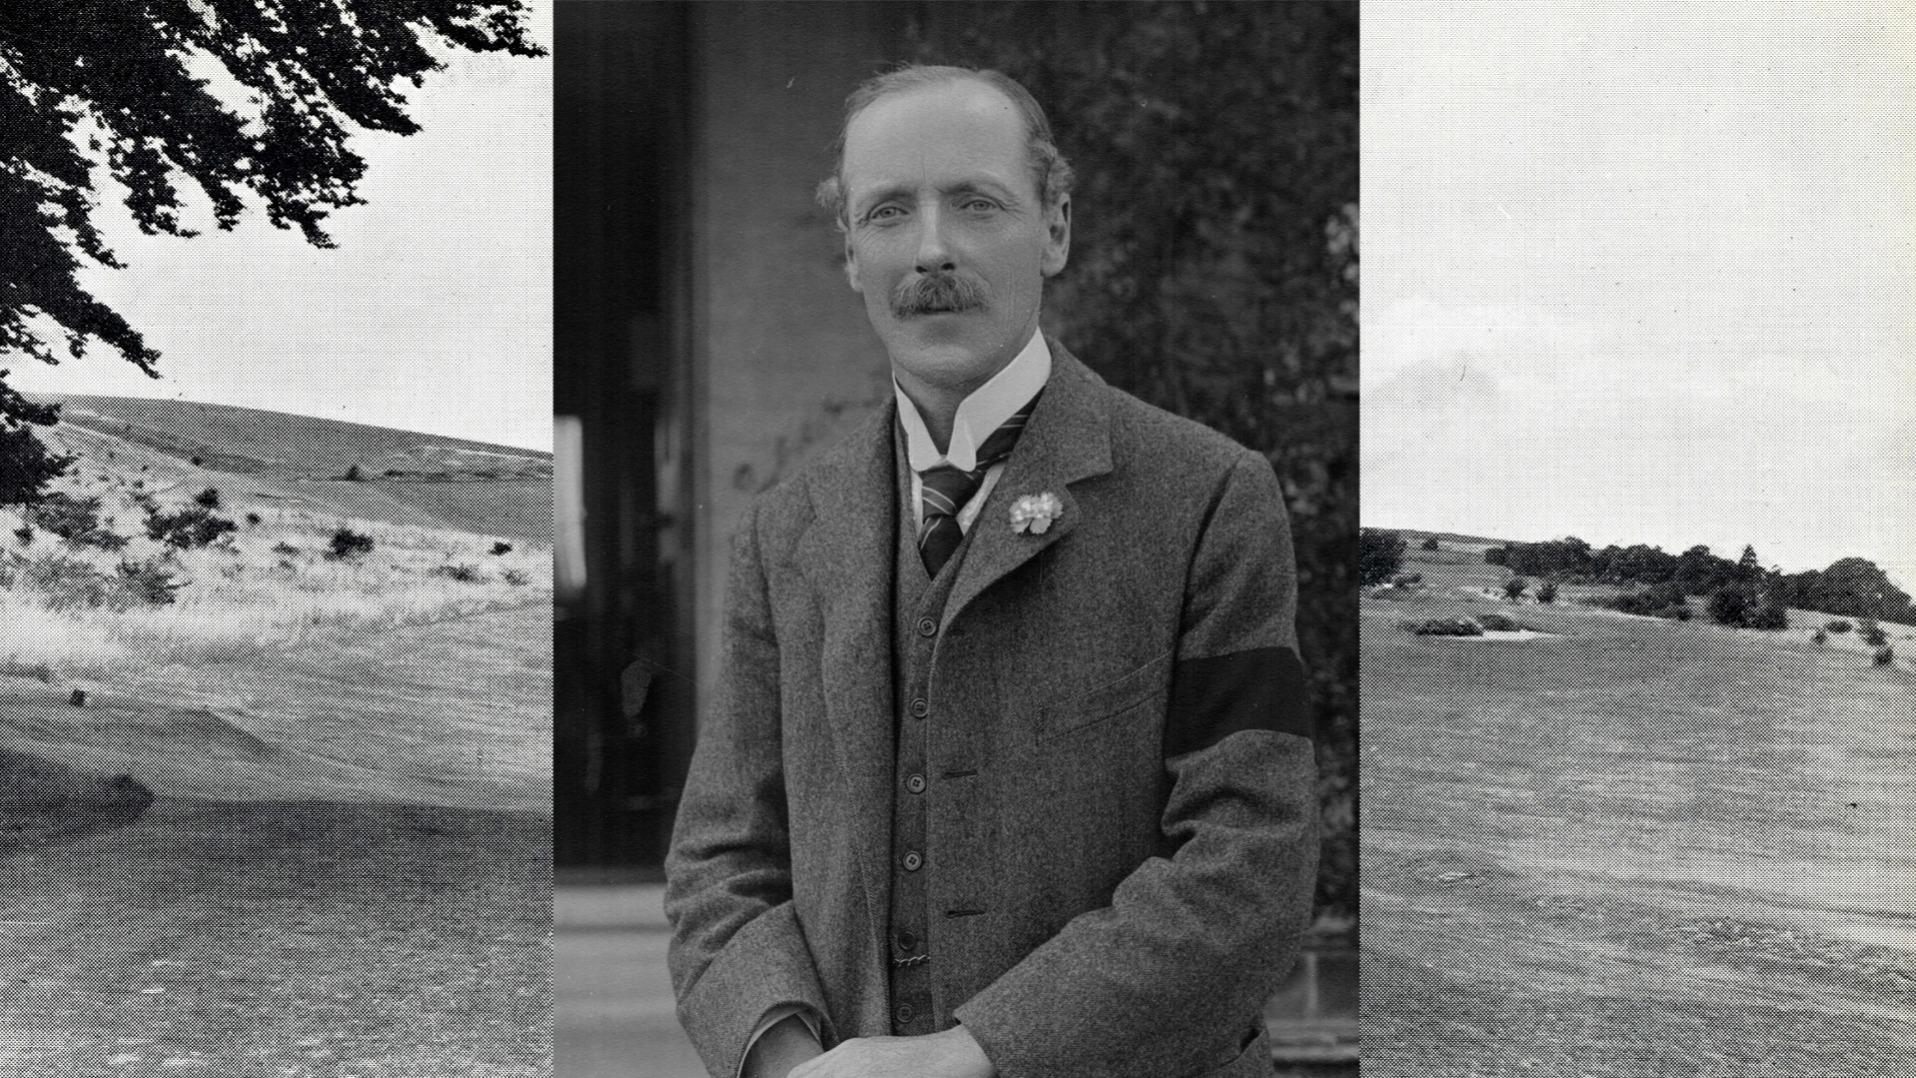 1908 - L C R Thring